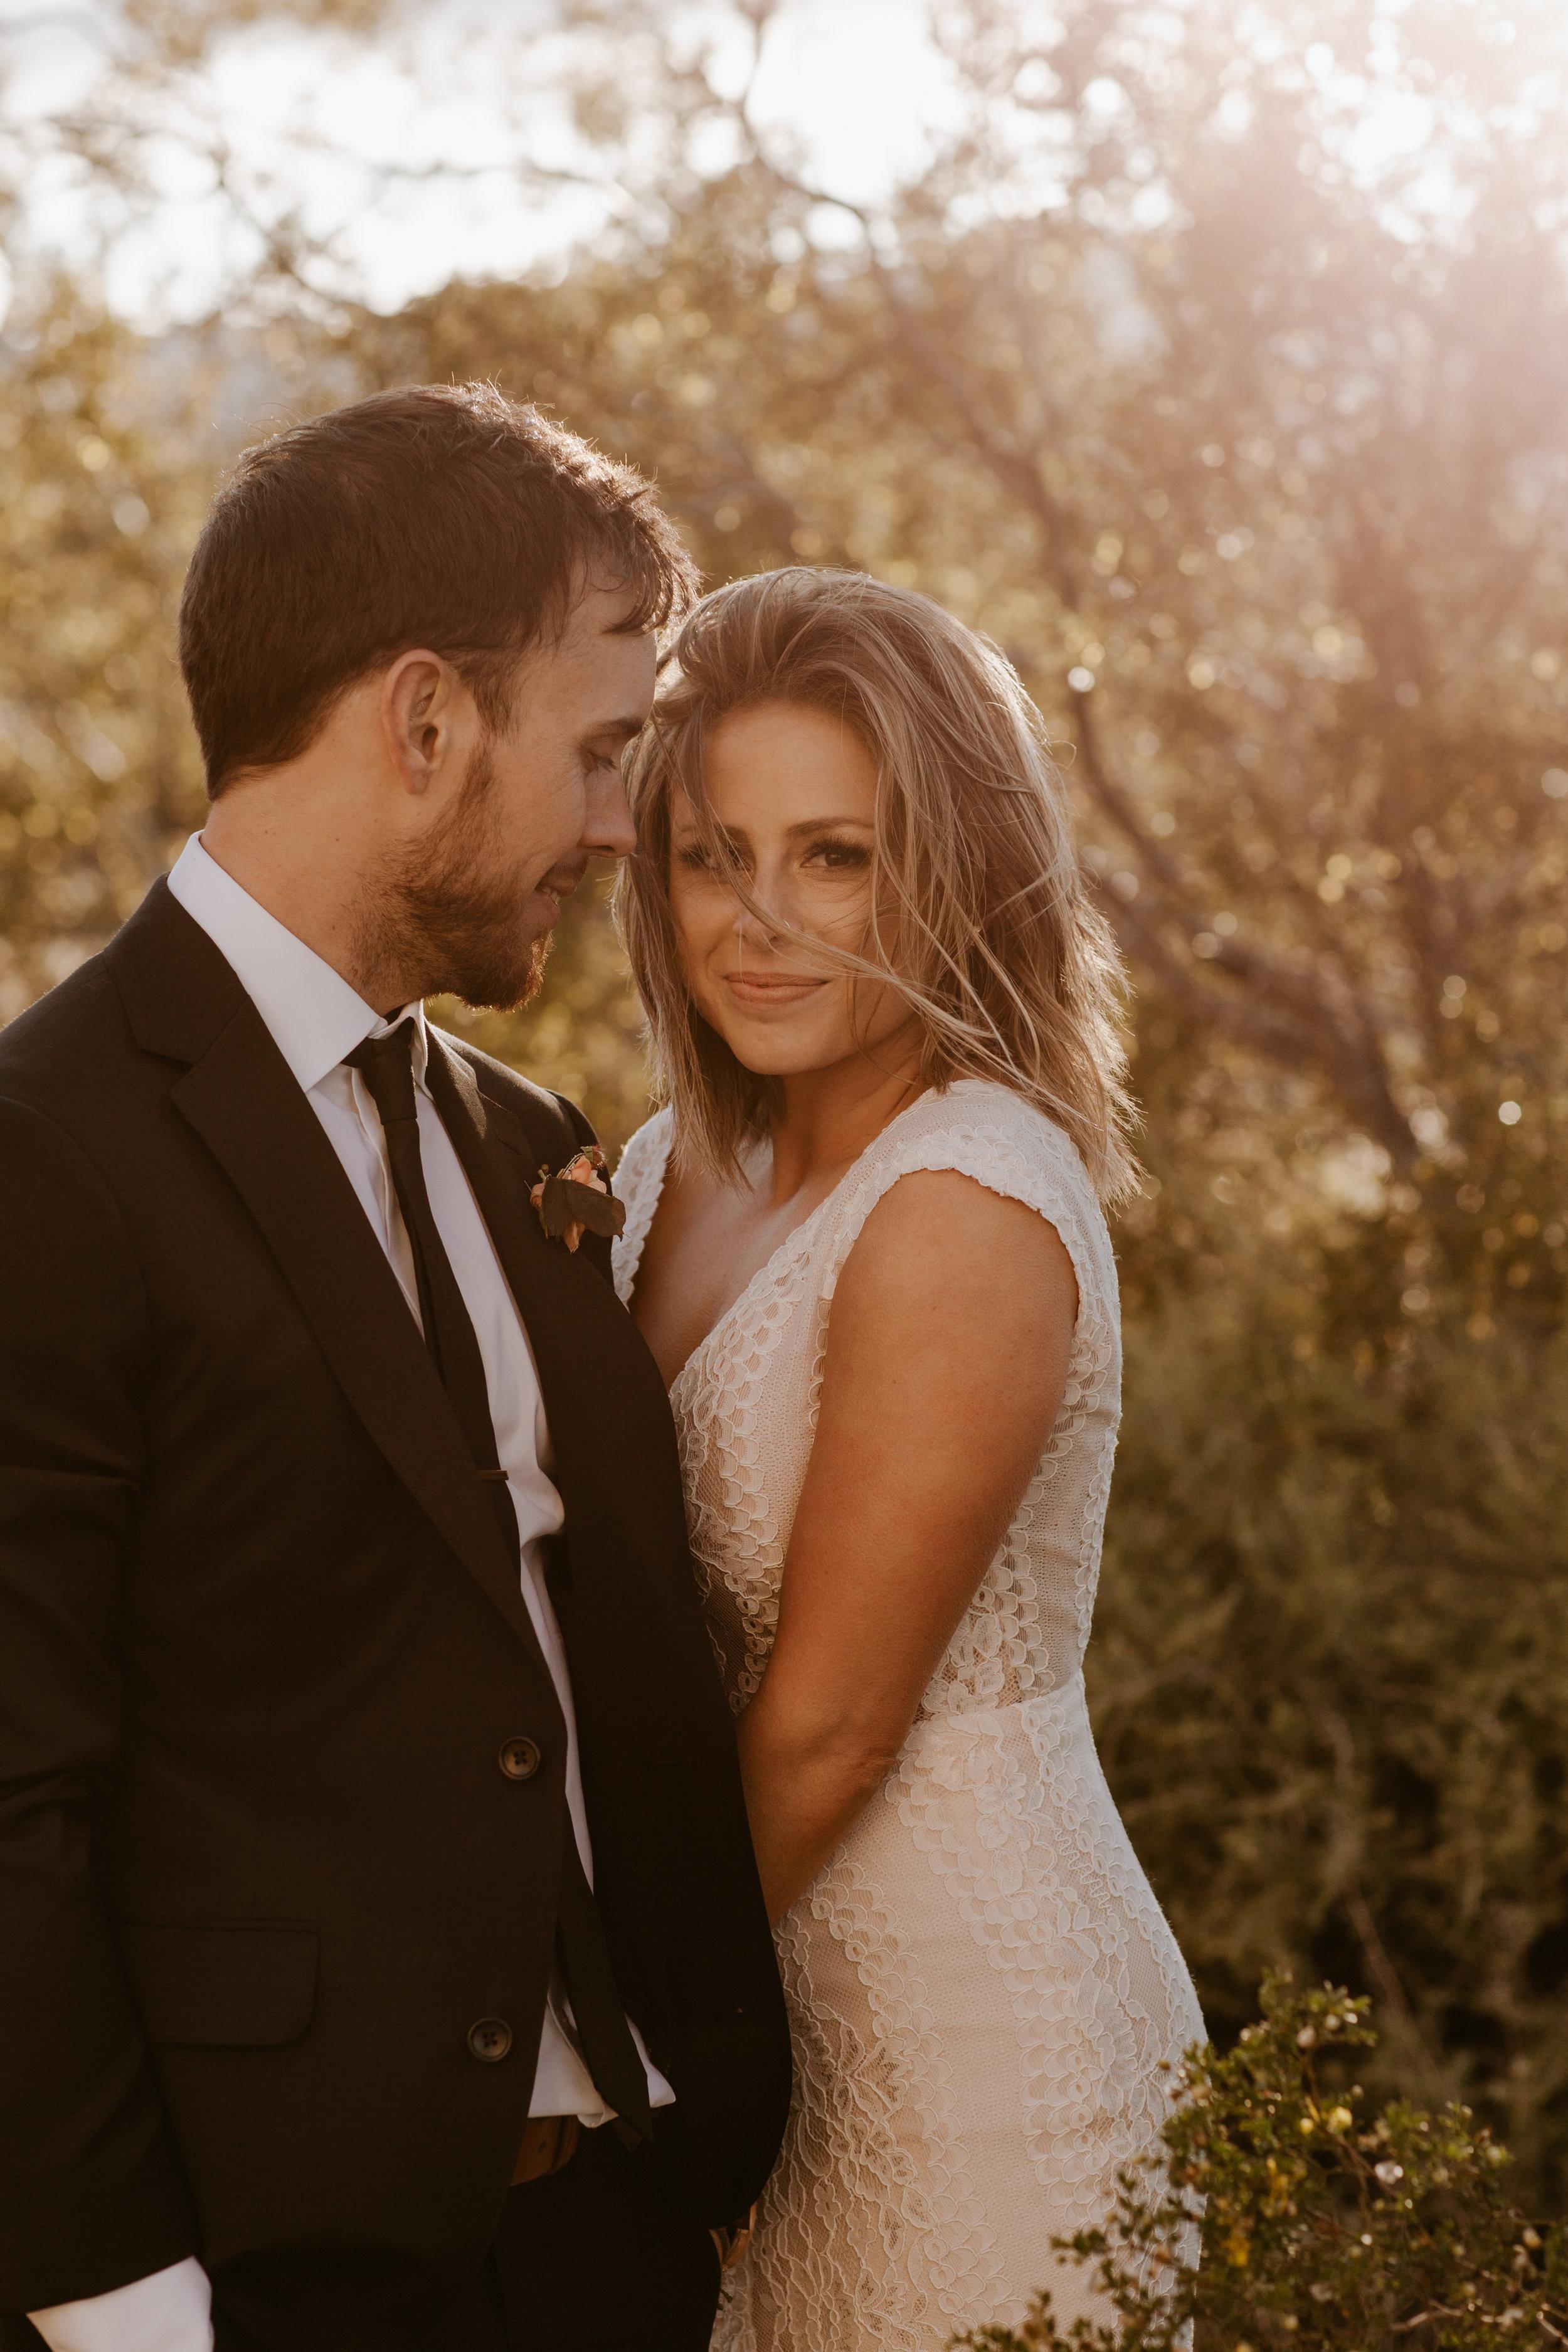 2019-05-26_Callie-Evan_Wedding_Joshua Tree_Paige Nelson_PREVIEWS HR-54.jpg